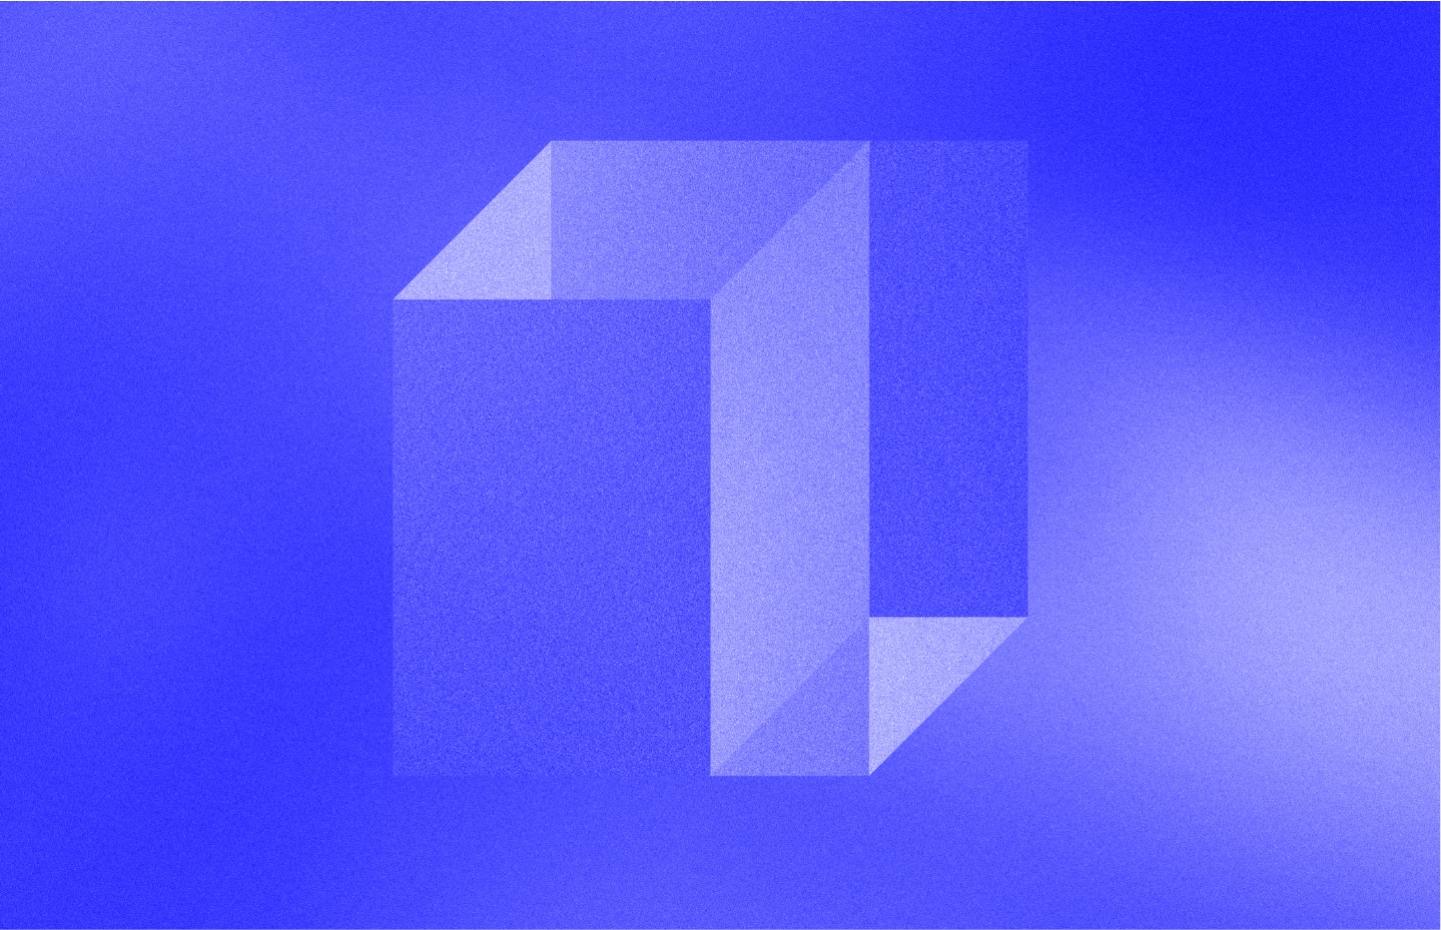 to June 9 | ART | AQUARIA — Or the Illusion of a Boxed Sea | €9 | Belém